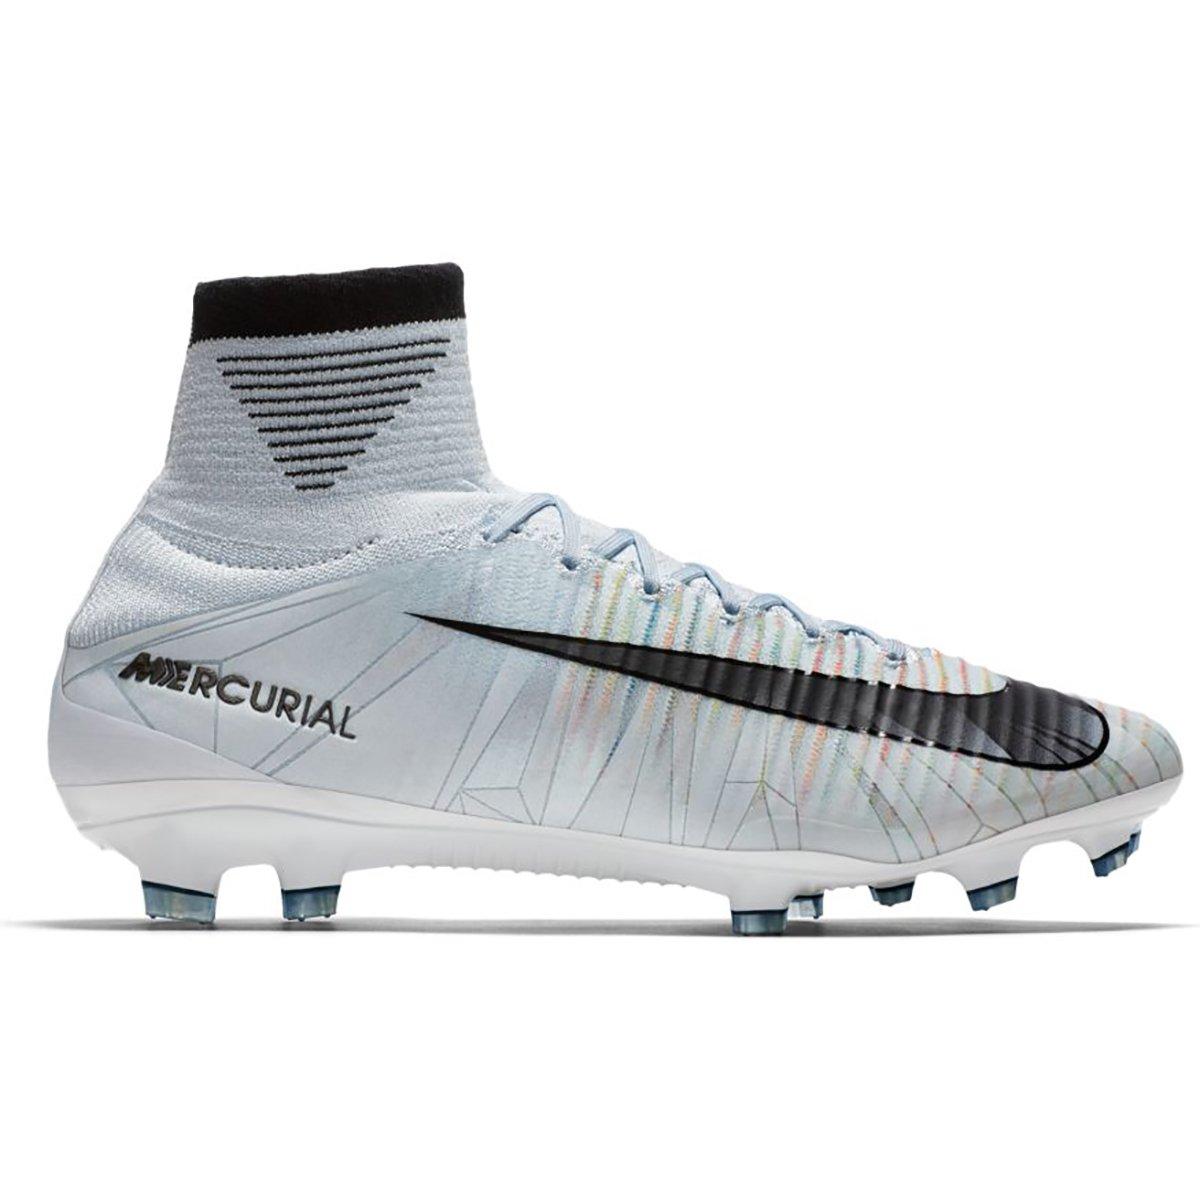 d1577efad Nike Mercurial Superfly V CR7 FG Football Boot Football Boots:  Amazon.co.uk: Sports & Outdoors